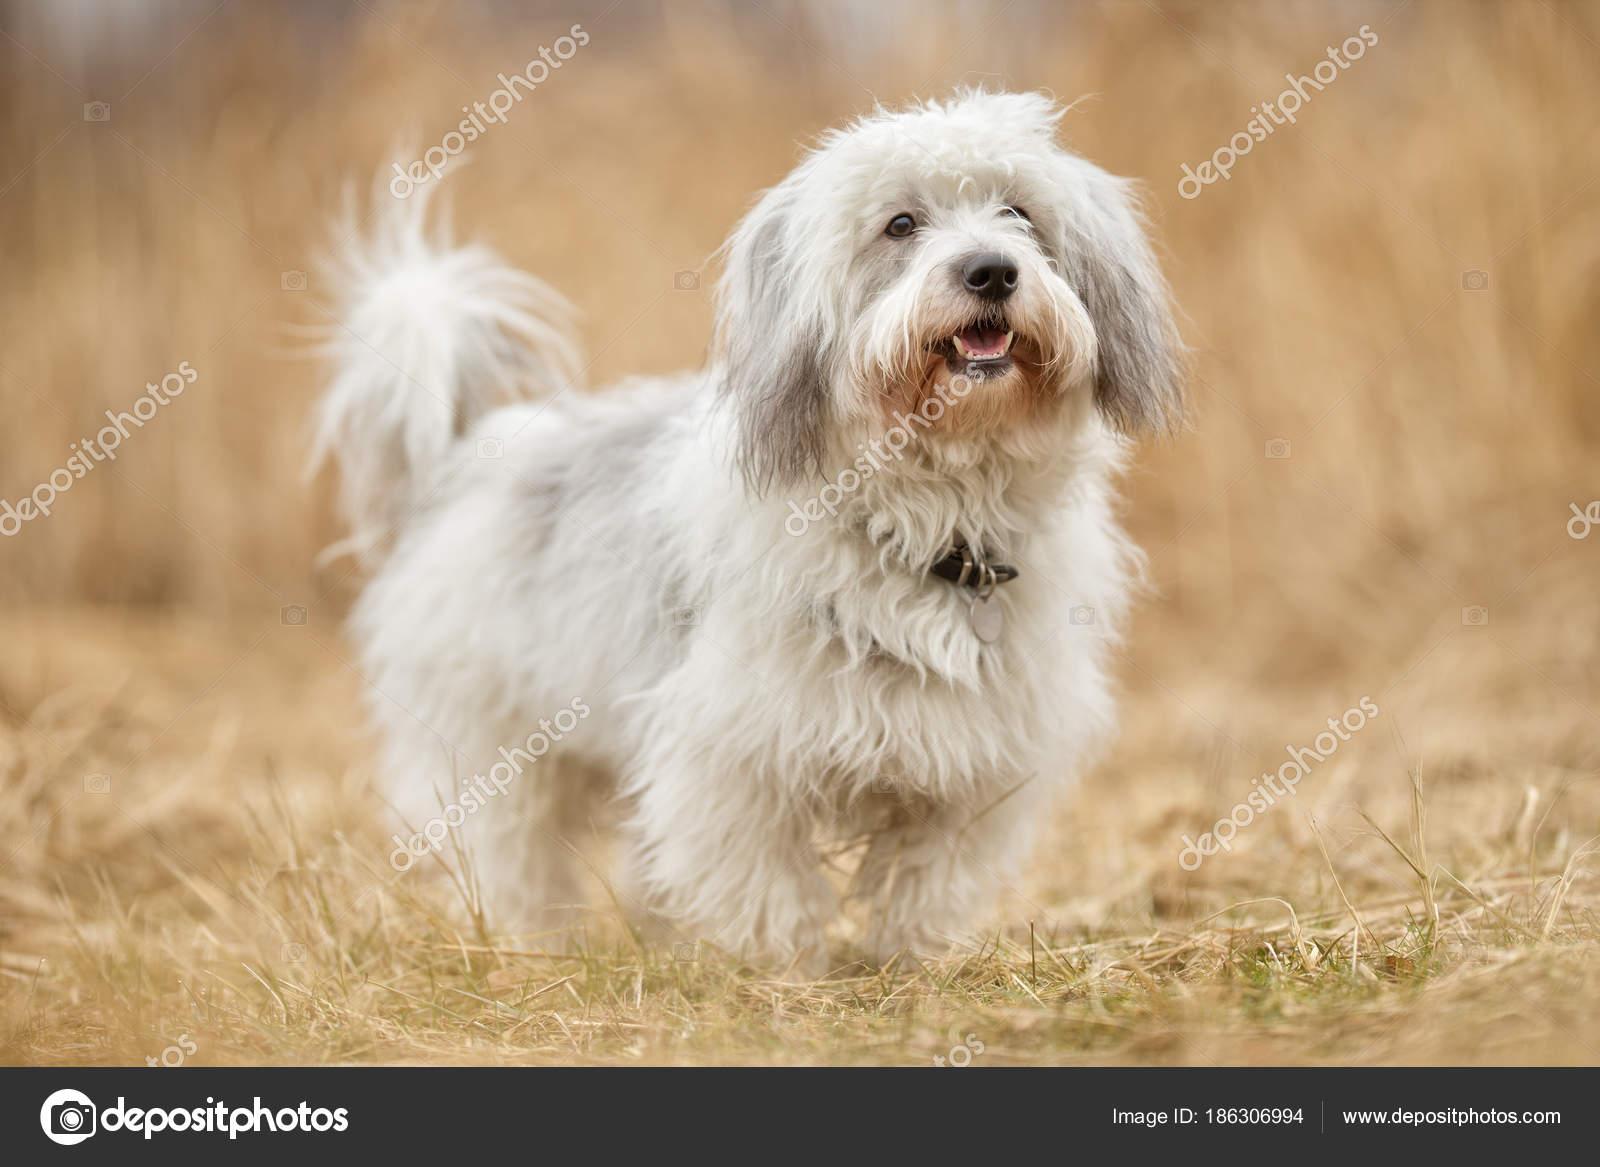 coton de tulear dog stock photo bigandt 186306994